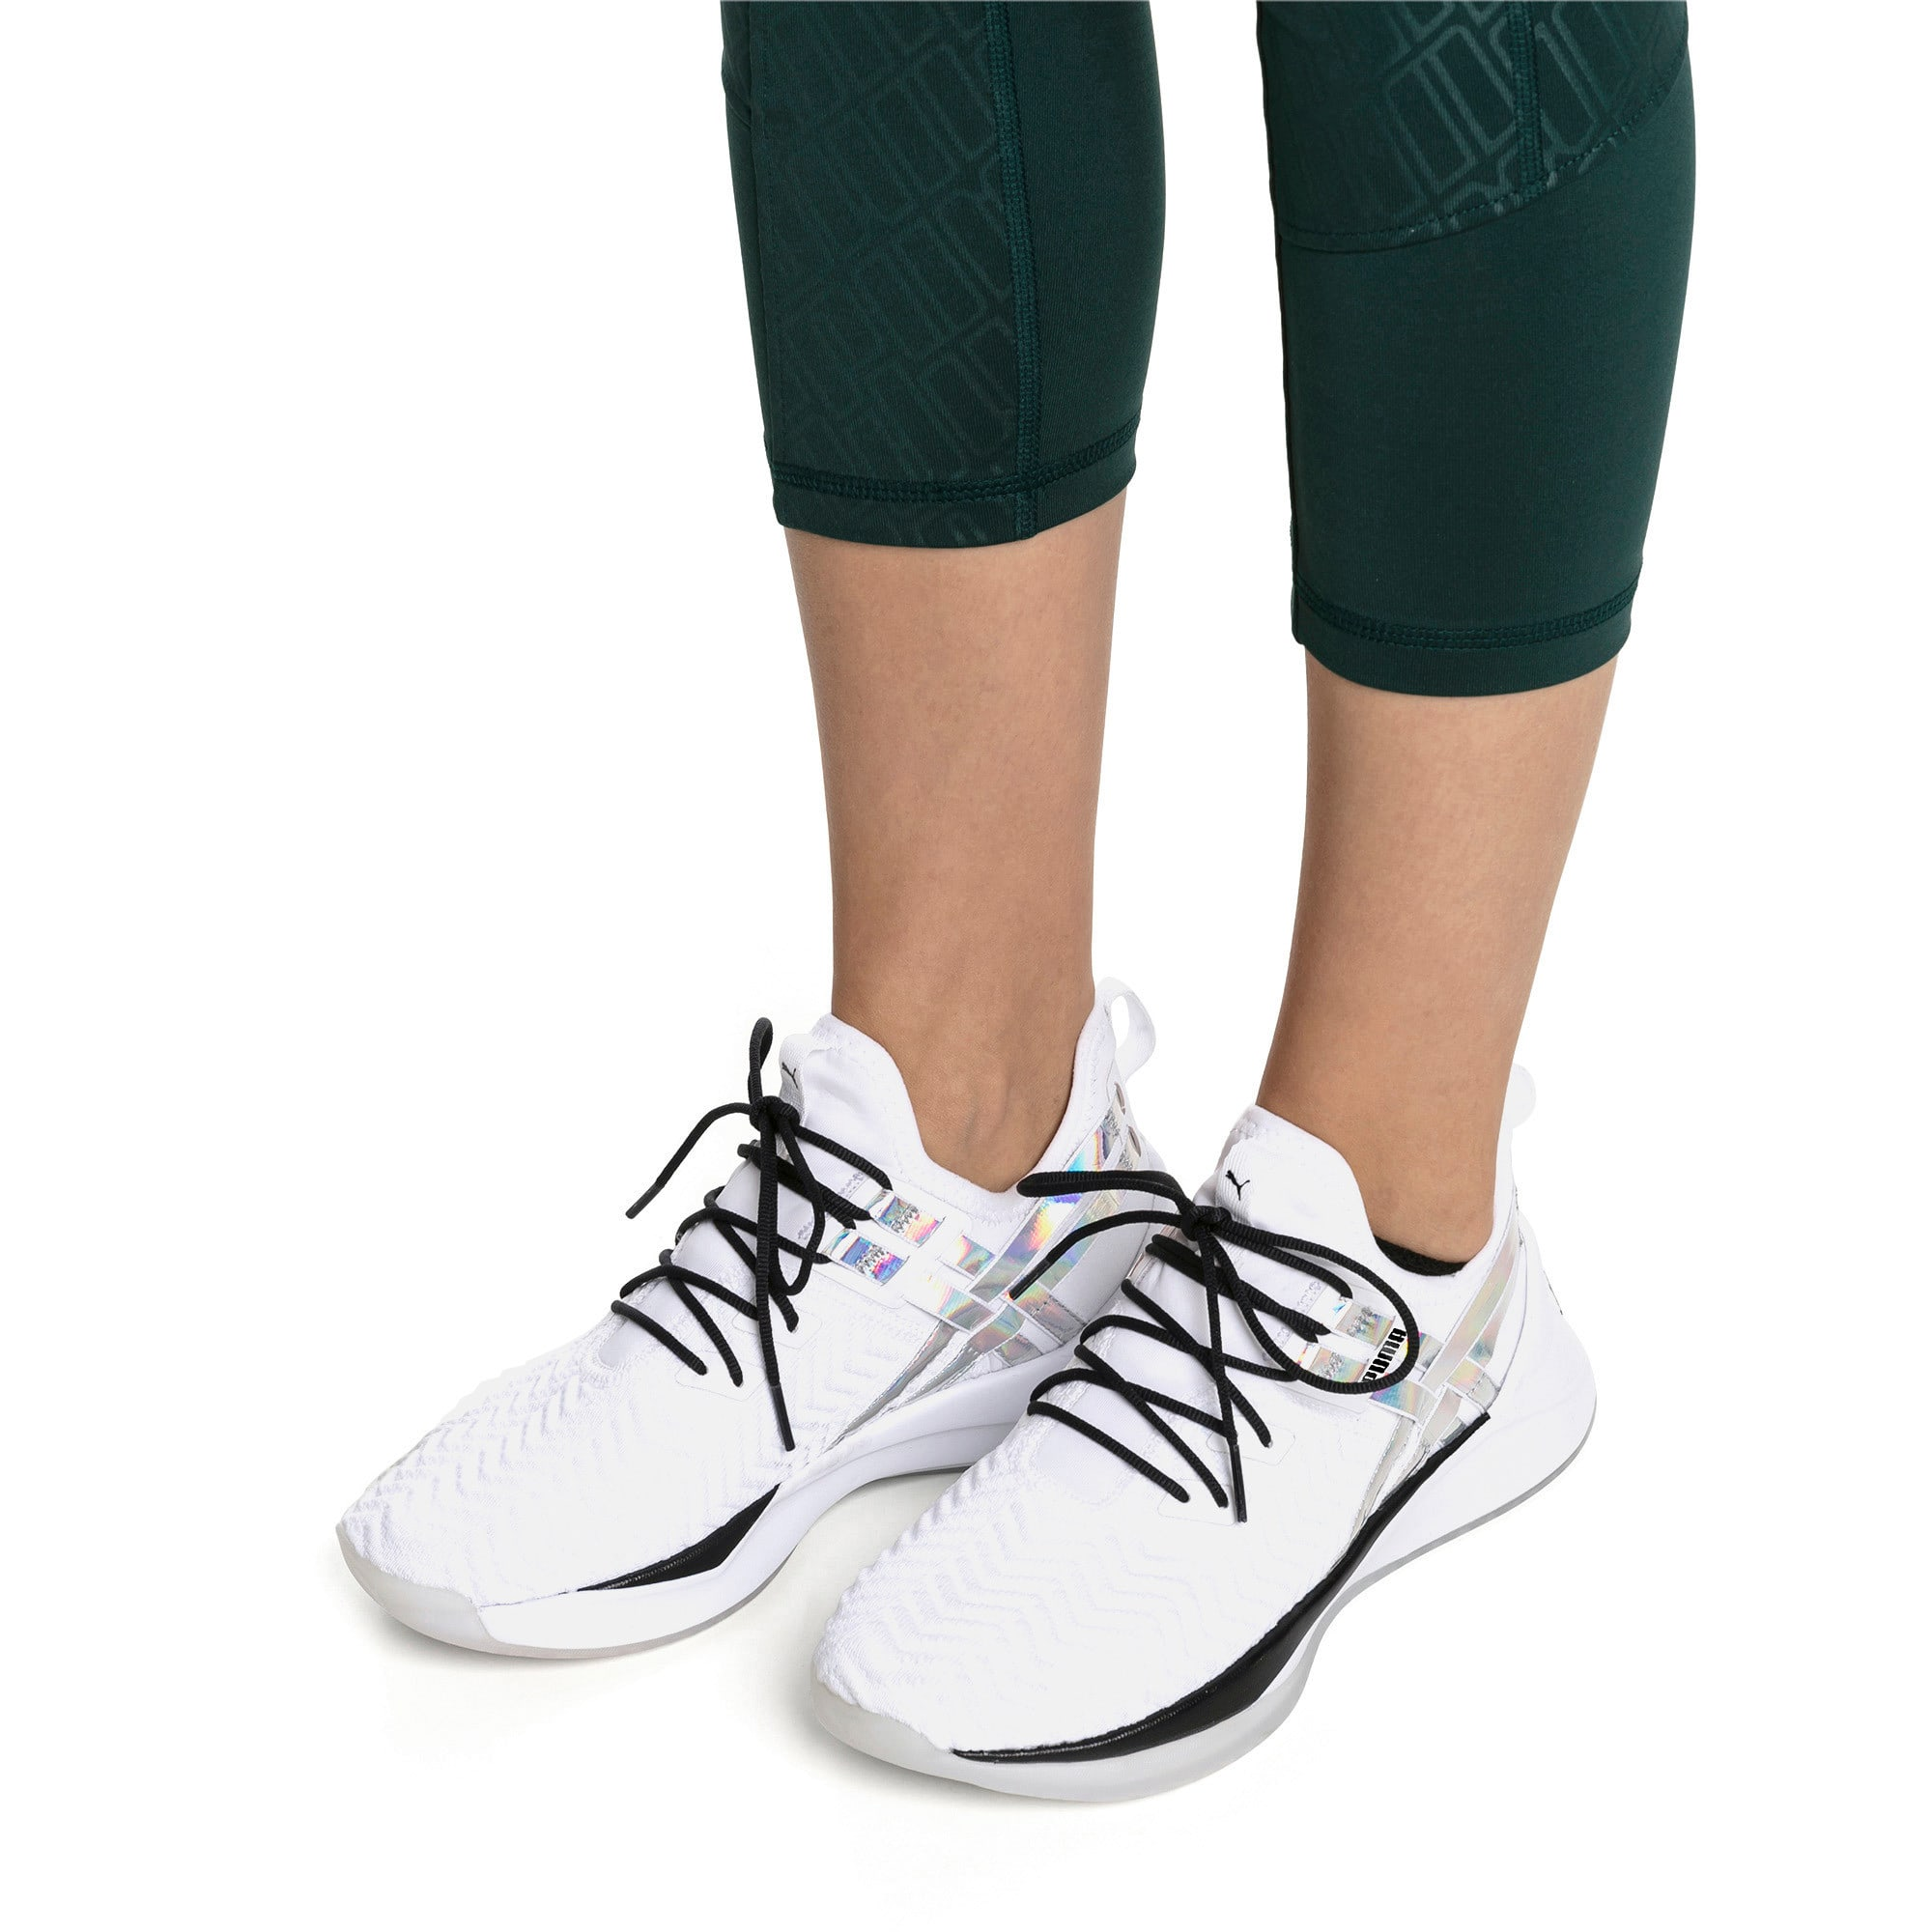 Thumbnail 2 of Jaab XT Iridescent Trailblazer Women's Training Shoes, Puma White-Puma Black, medium